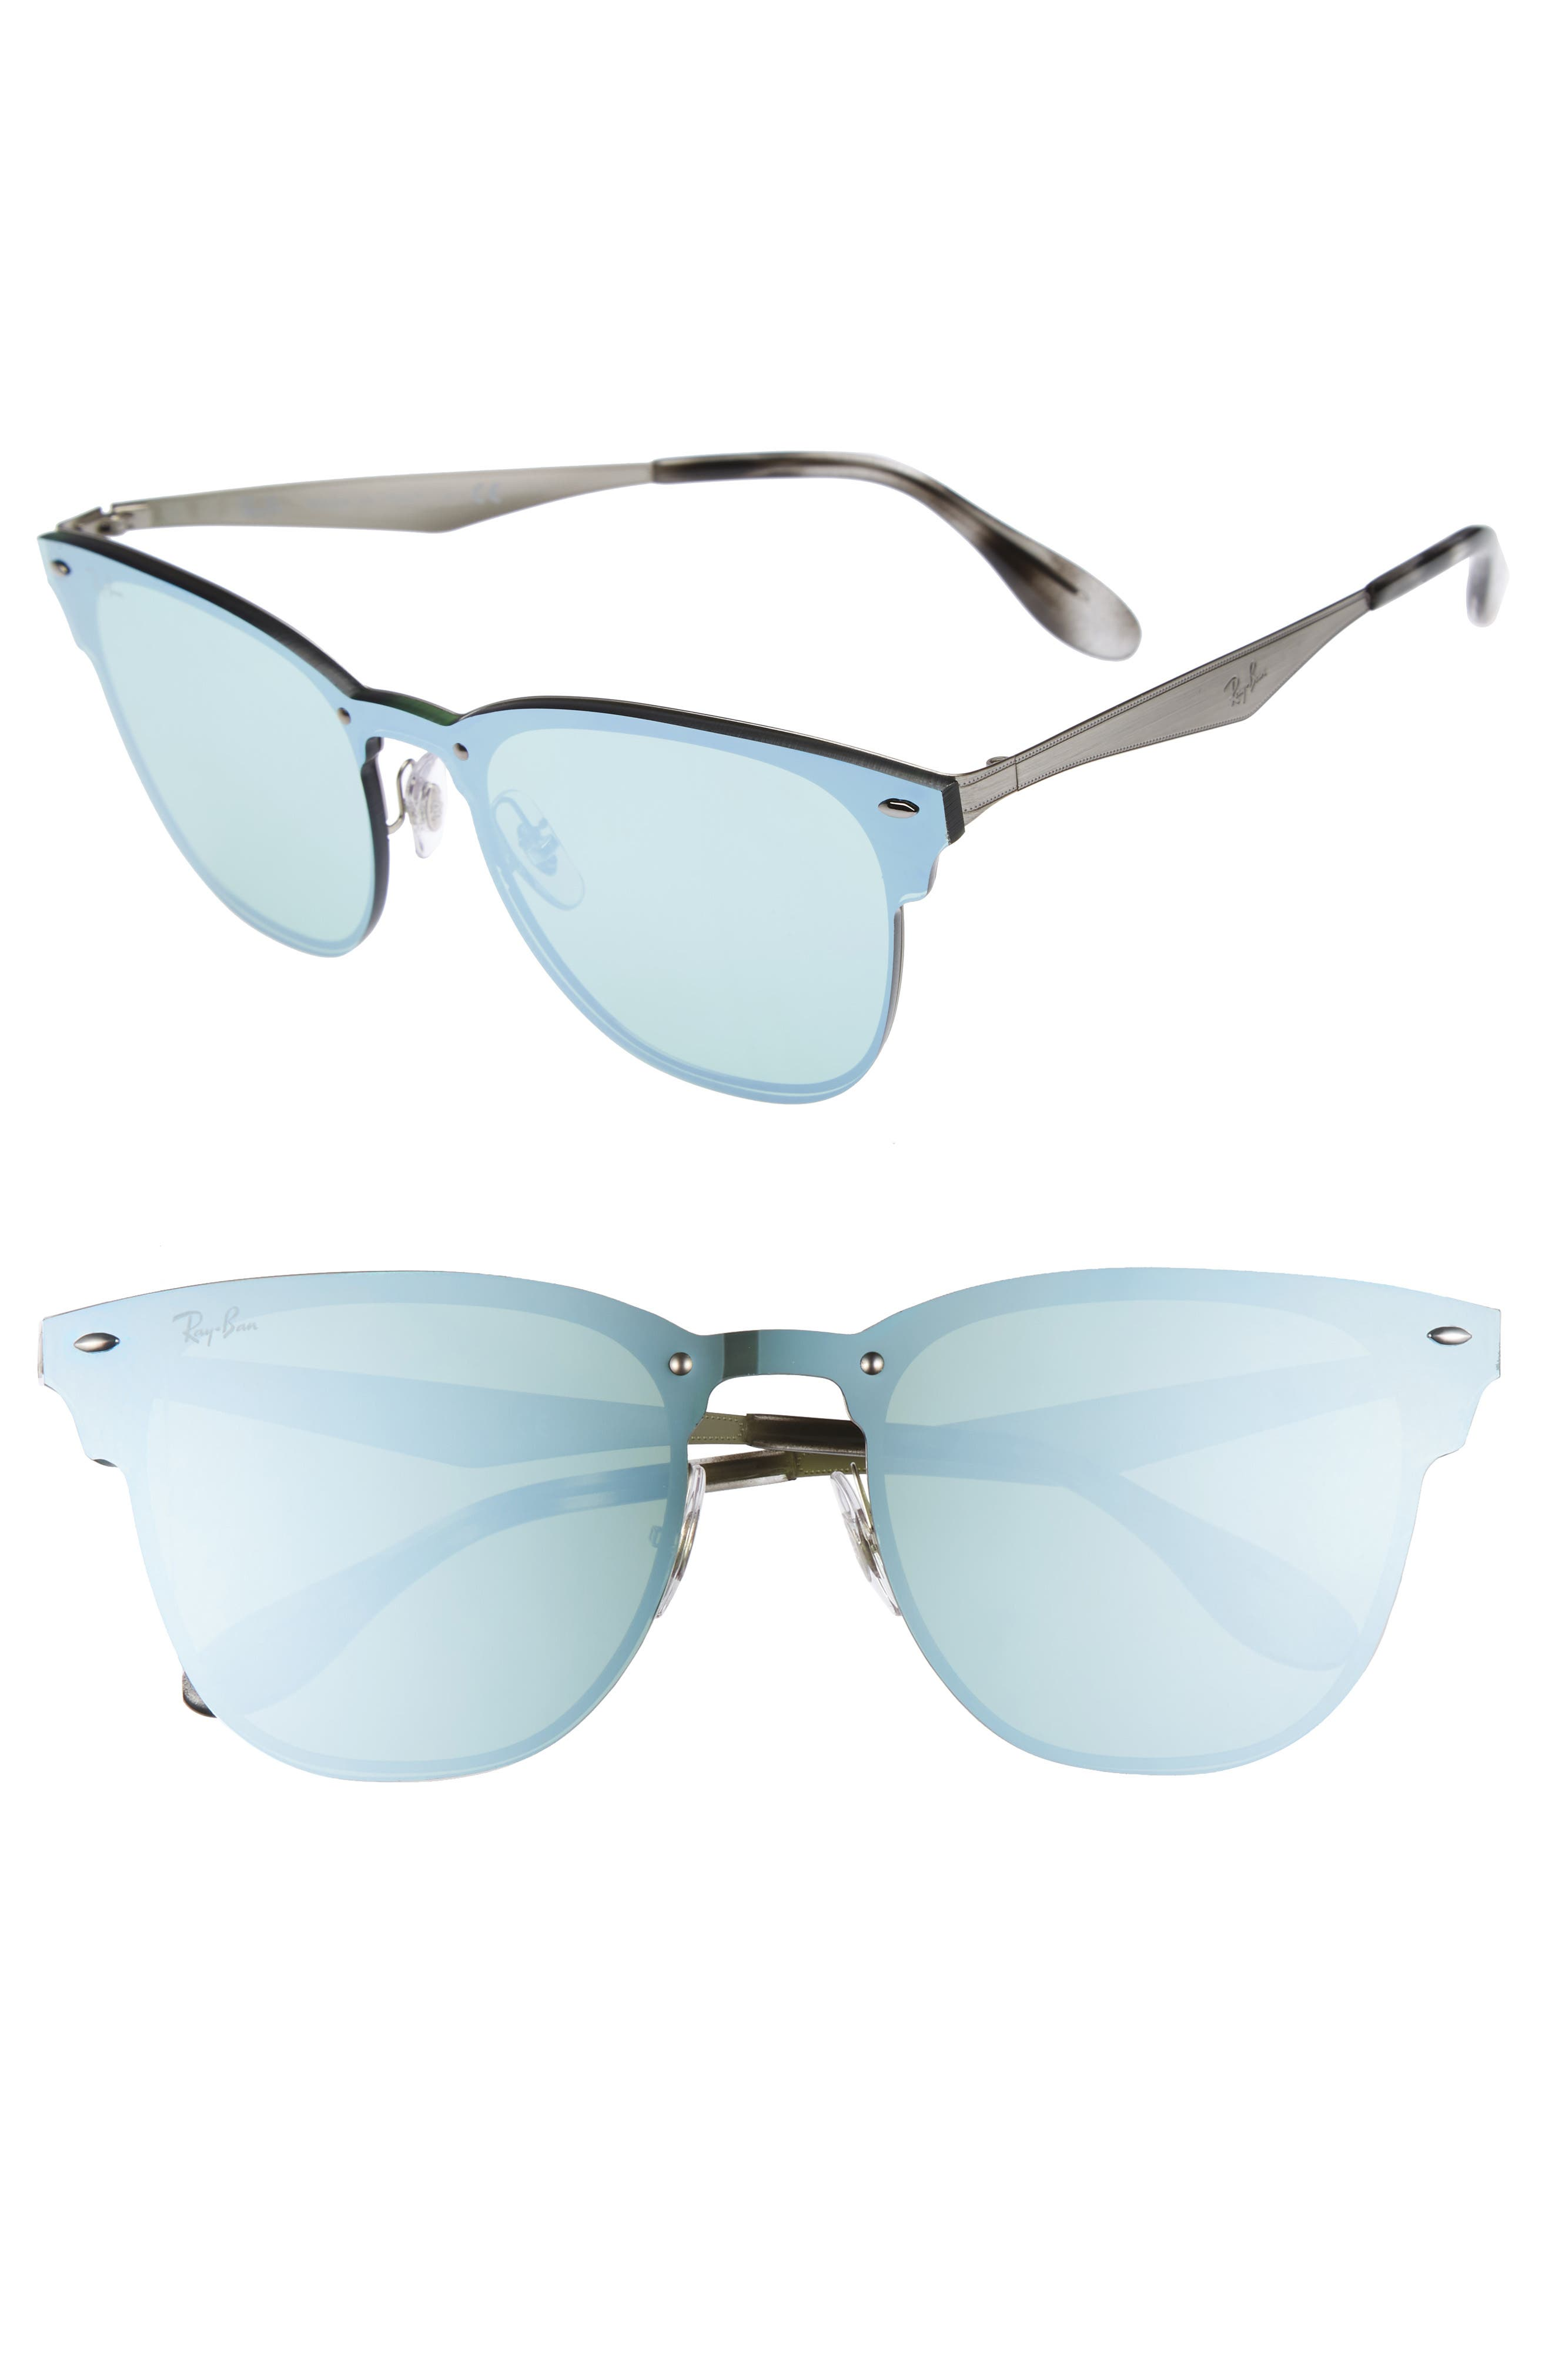 52mm Mirrored Sunglasses,                         Main,                         color, 040